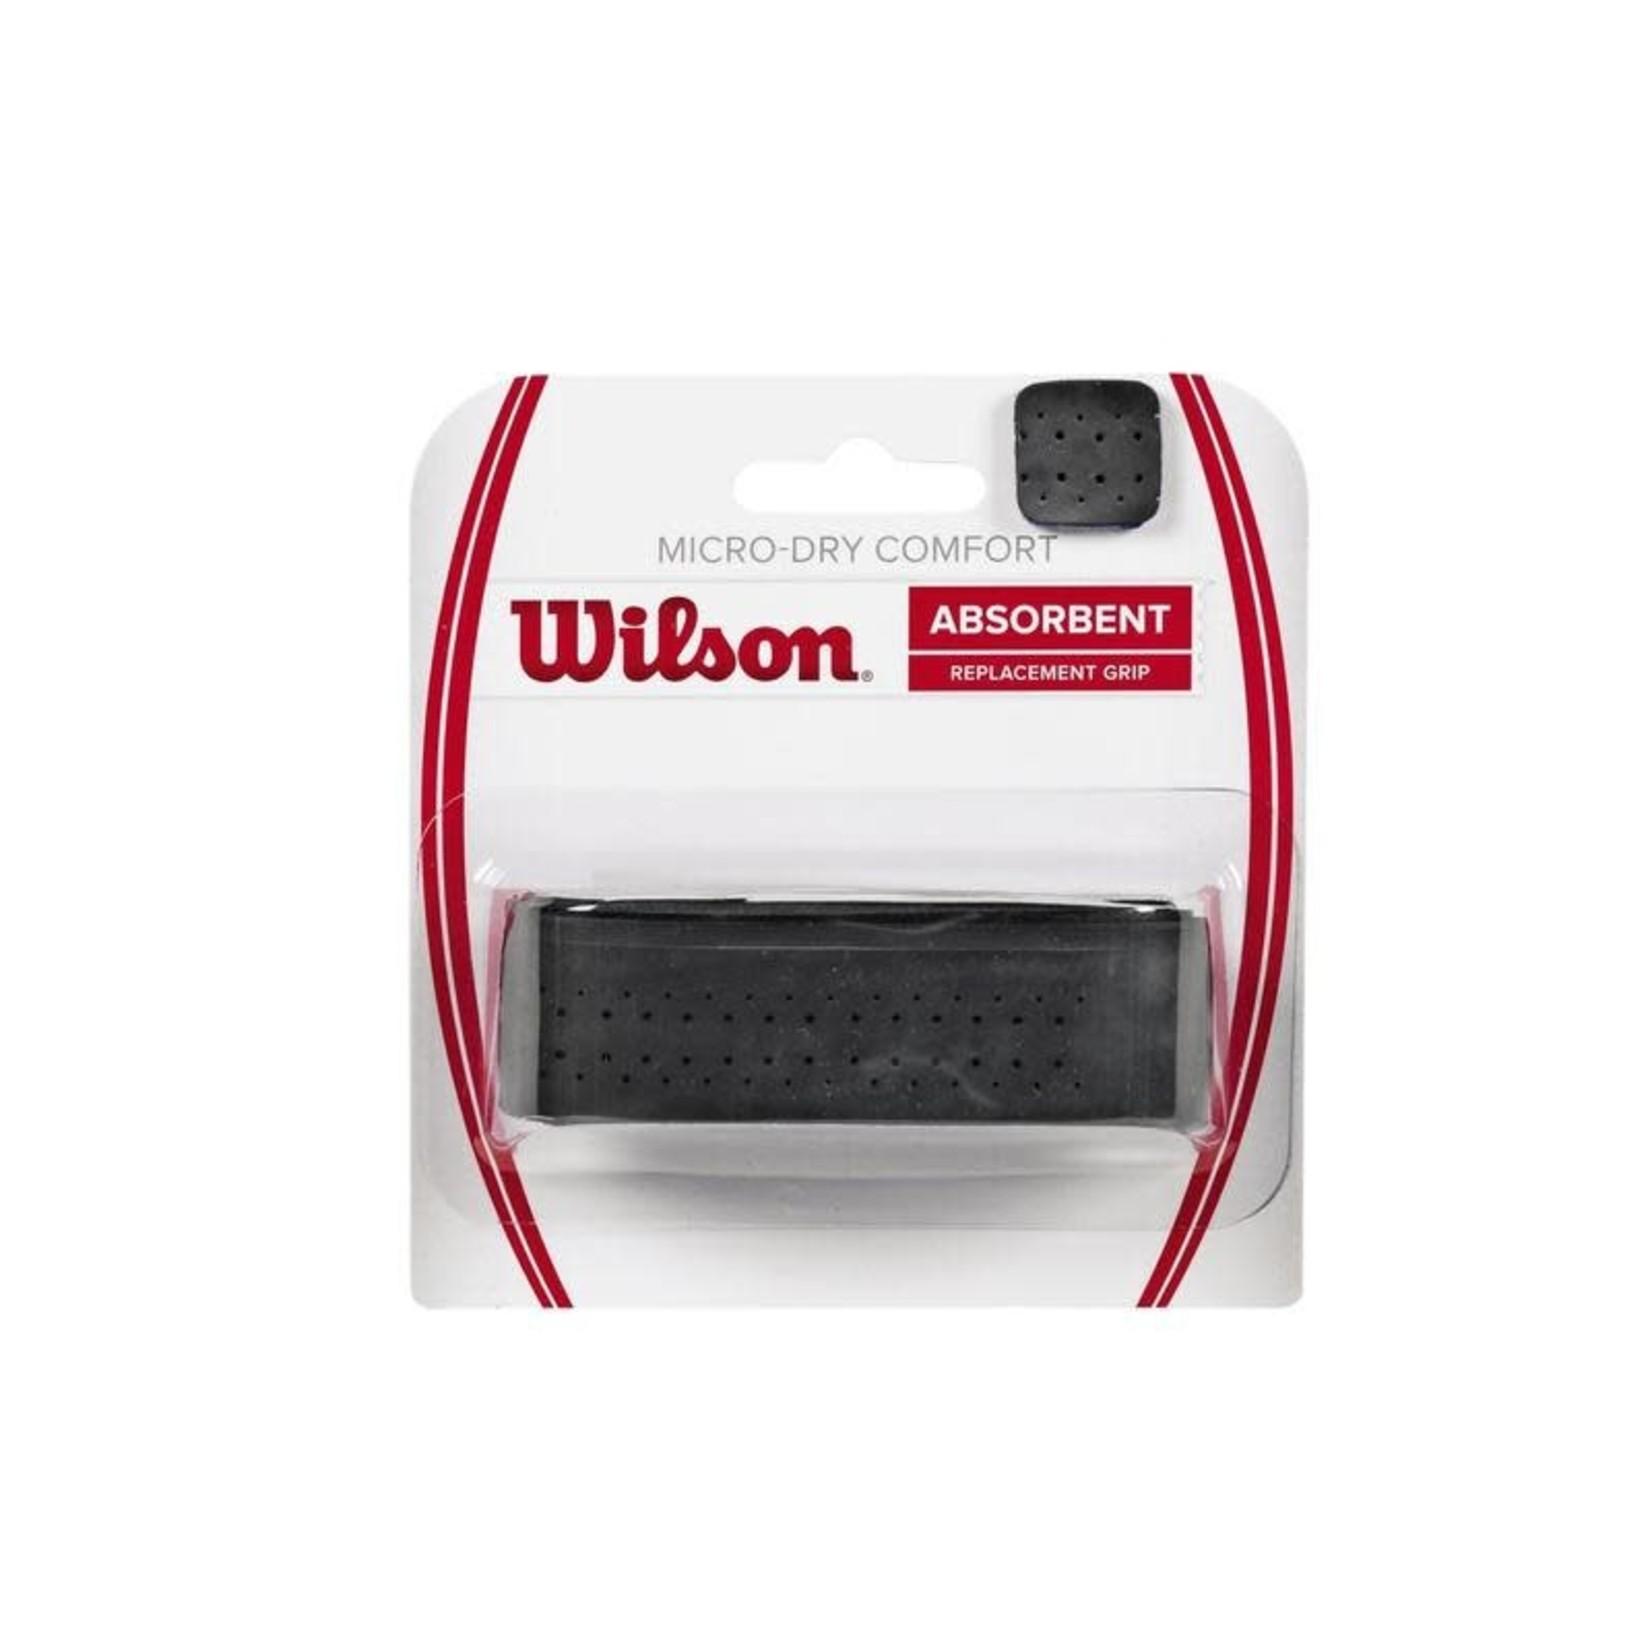 Wilson Micro-Dry Comfort Basigrip Zwart